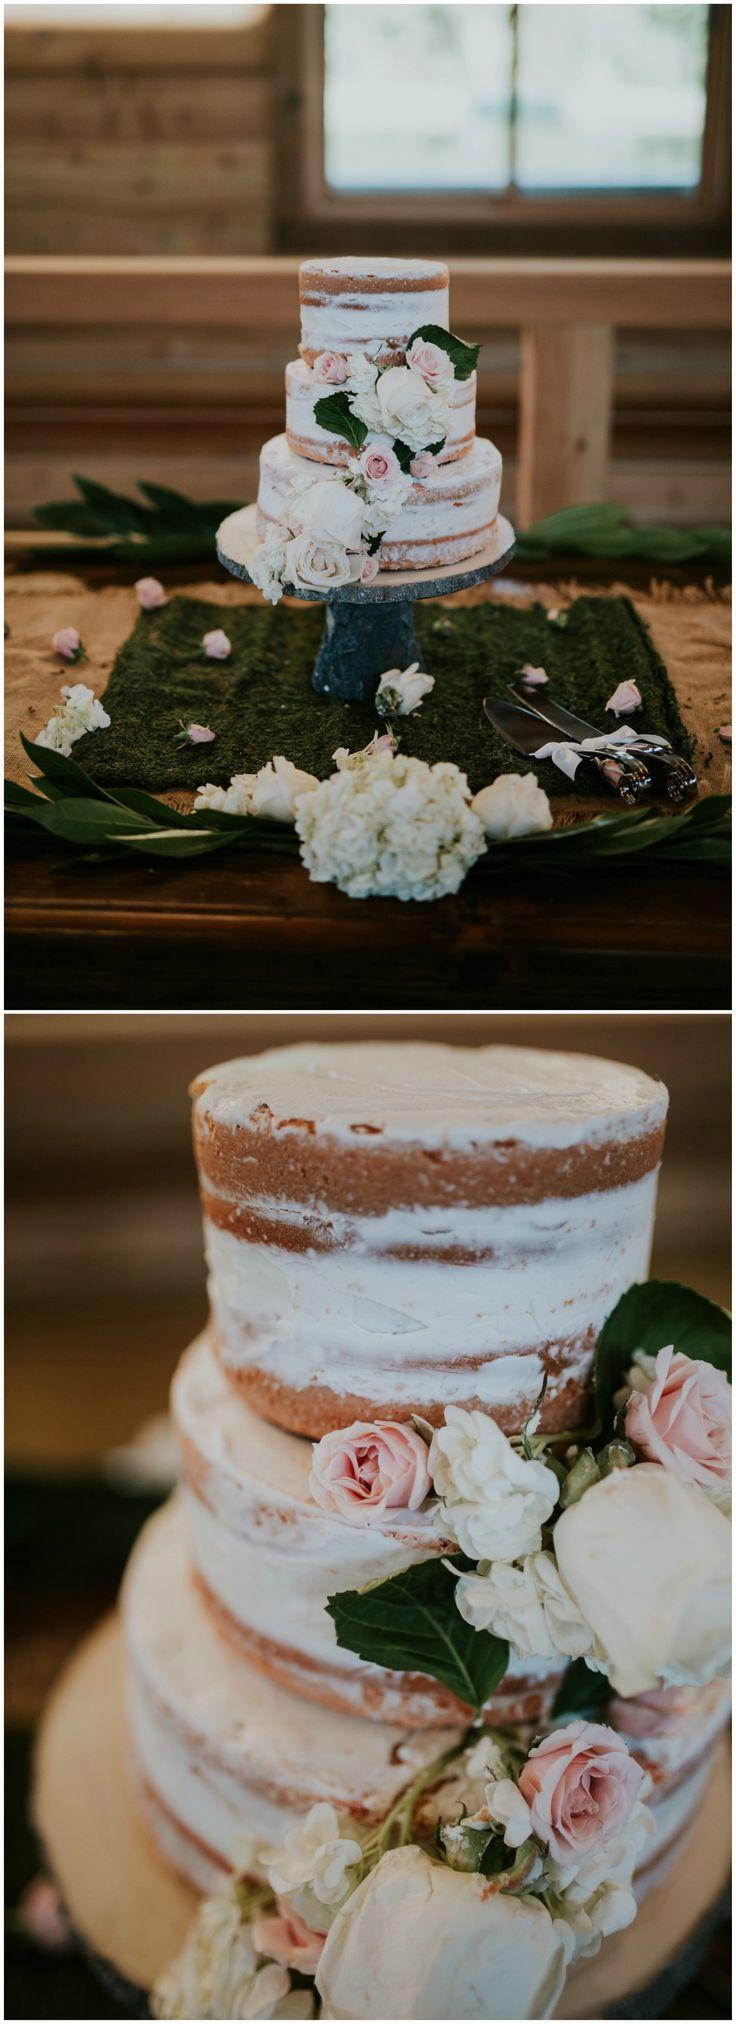 Romantic naked cake, white and pastel pink roses, rustic-chic wedding cake // Erin Turner Photo